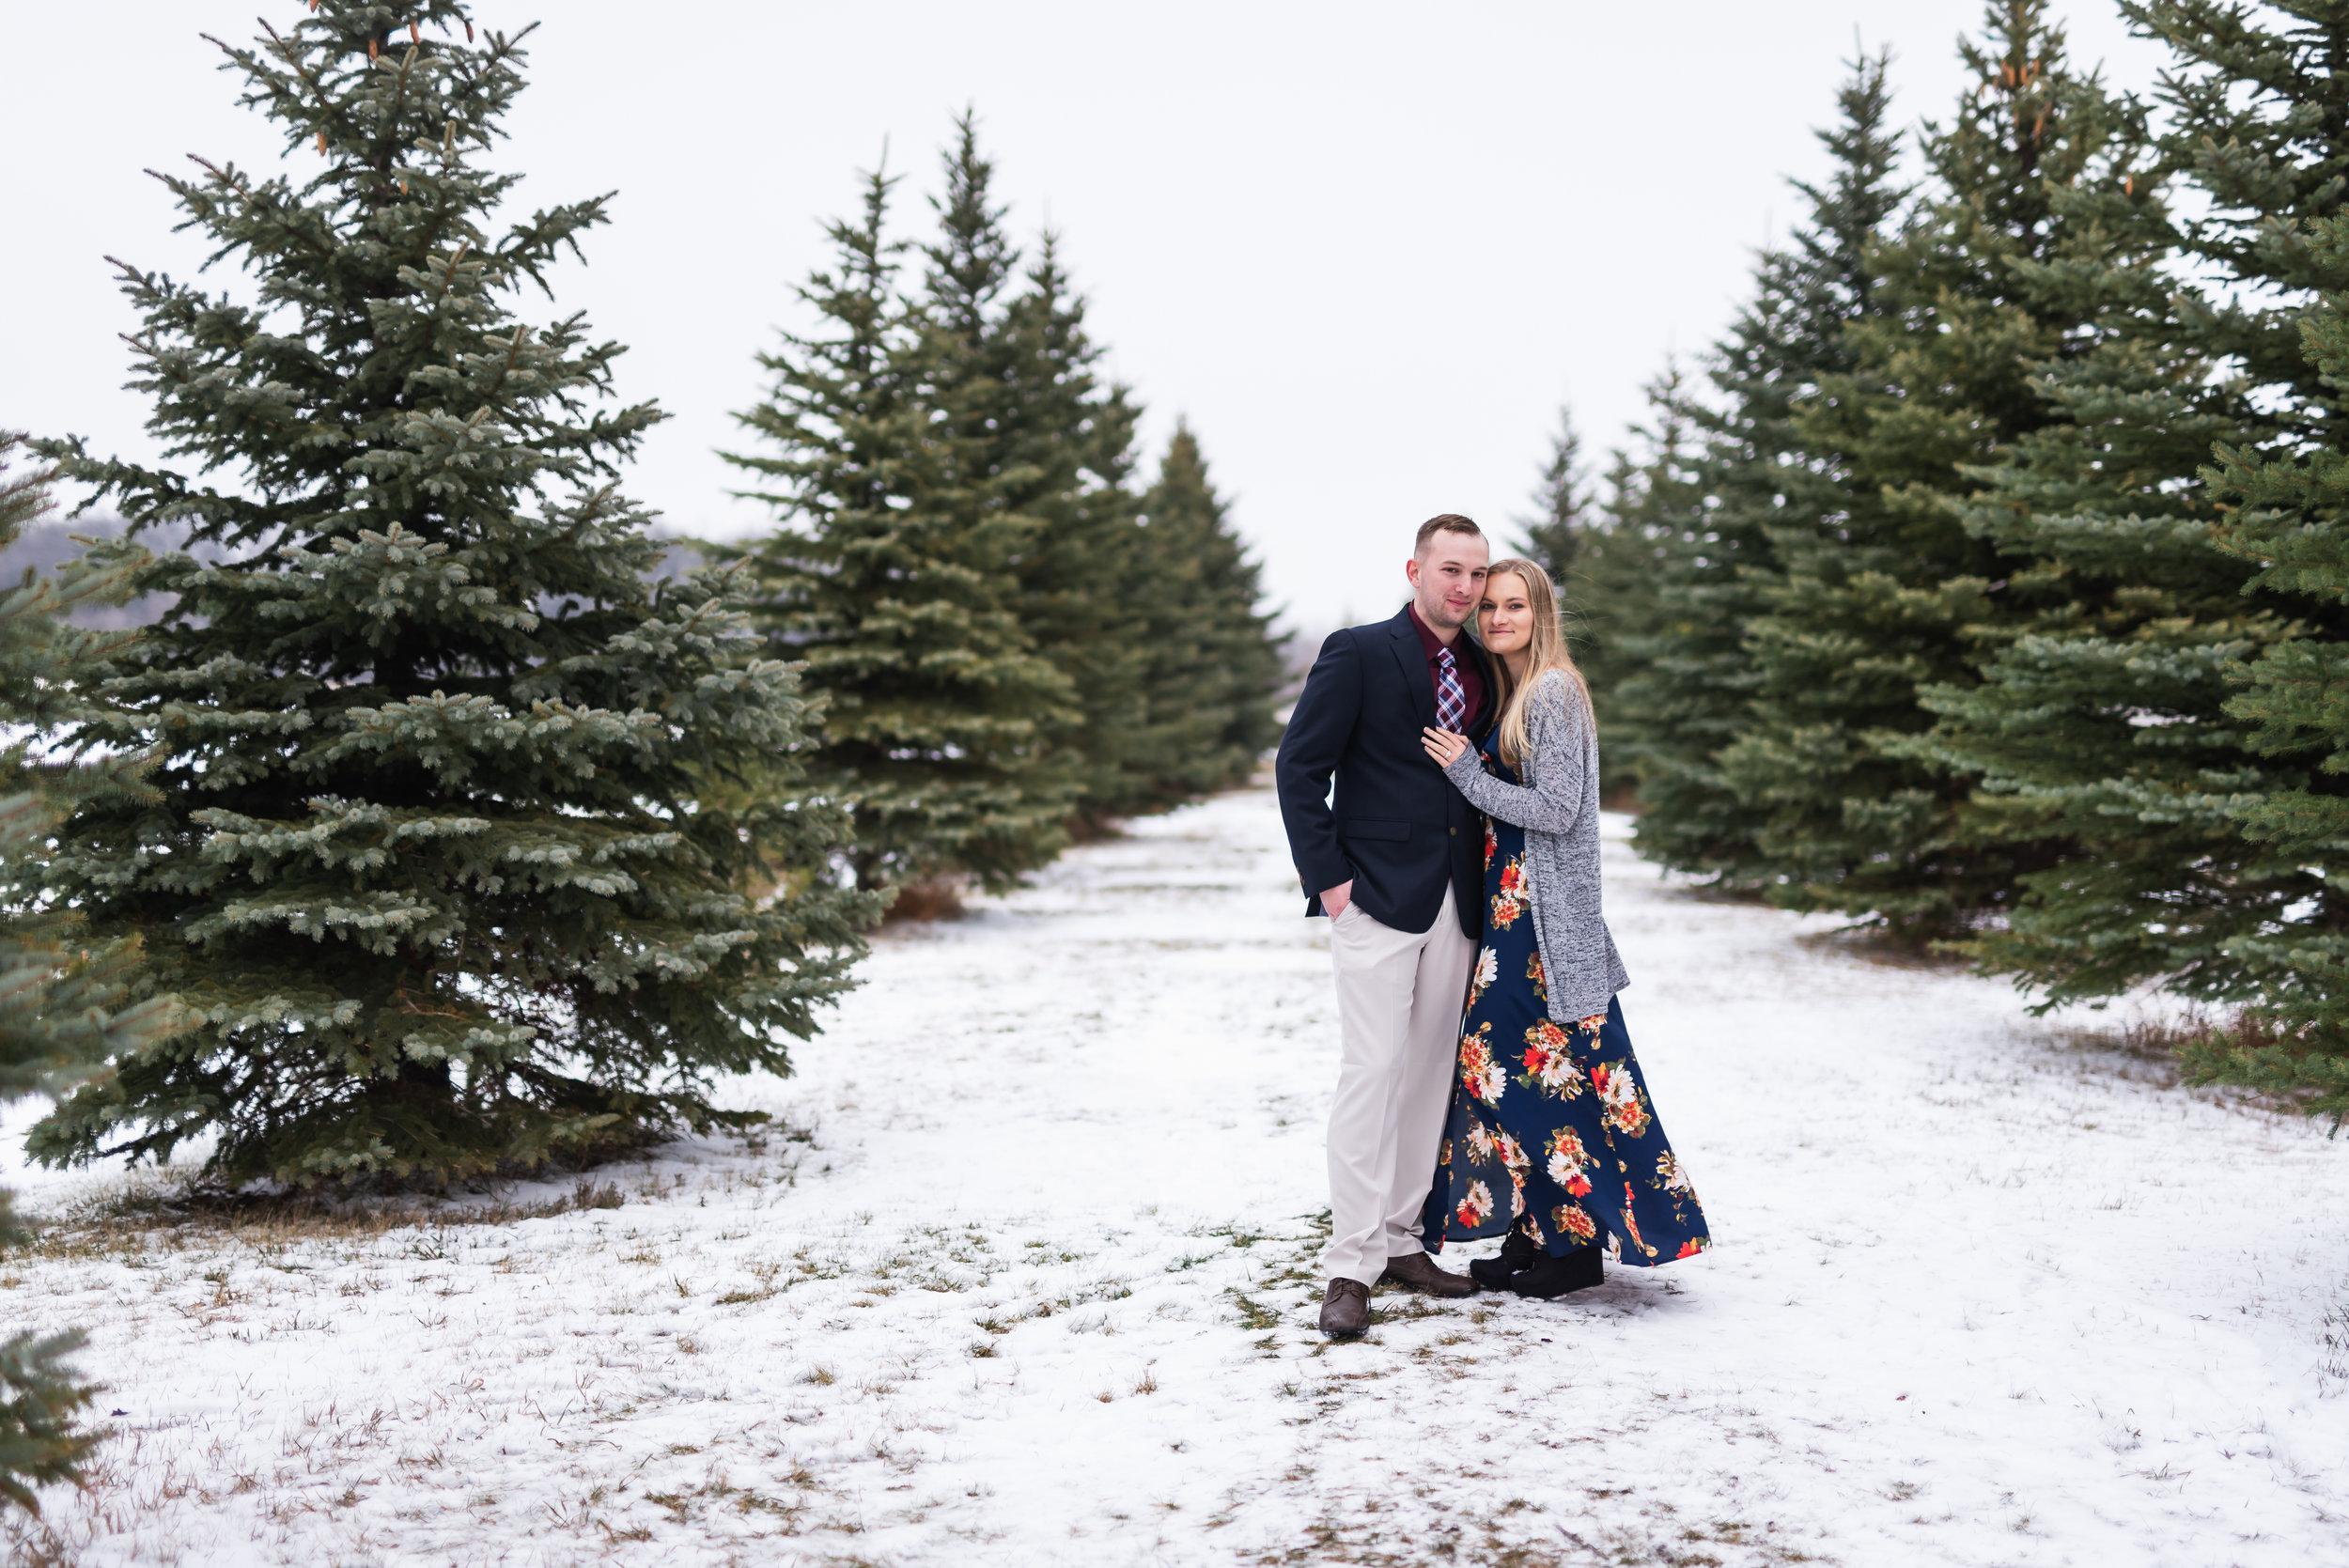 Fargo Winter Engagement Photos - Chelsea Joy Photography - Fargo Wedding Photographer